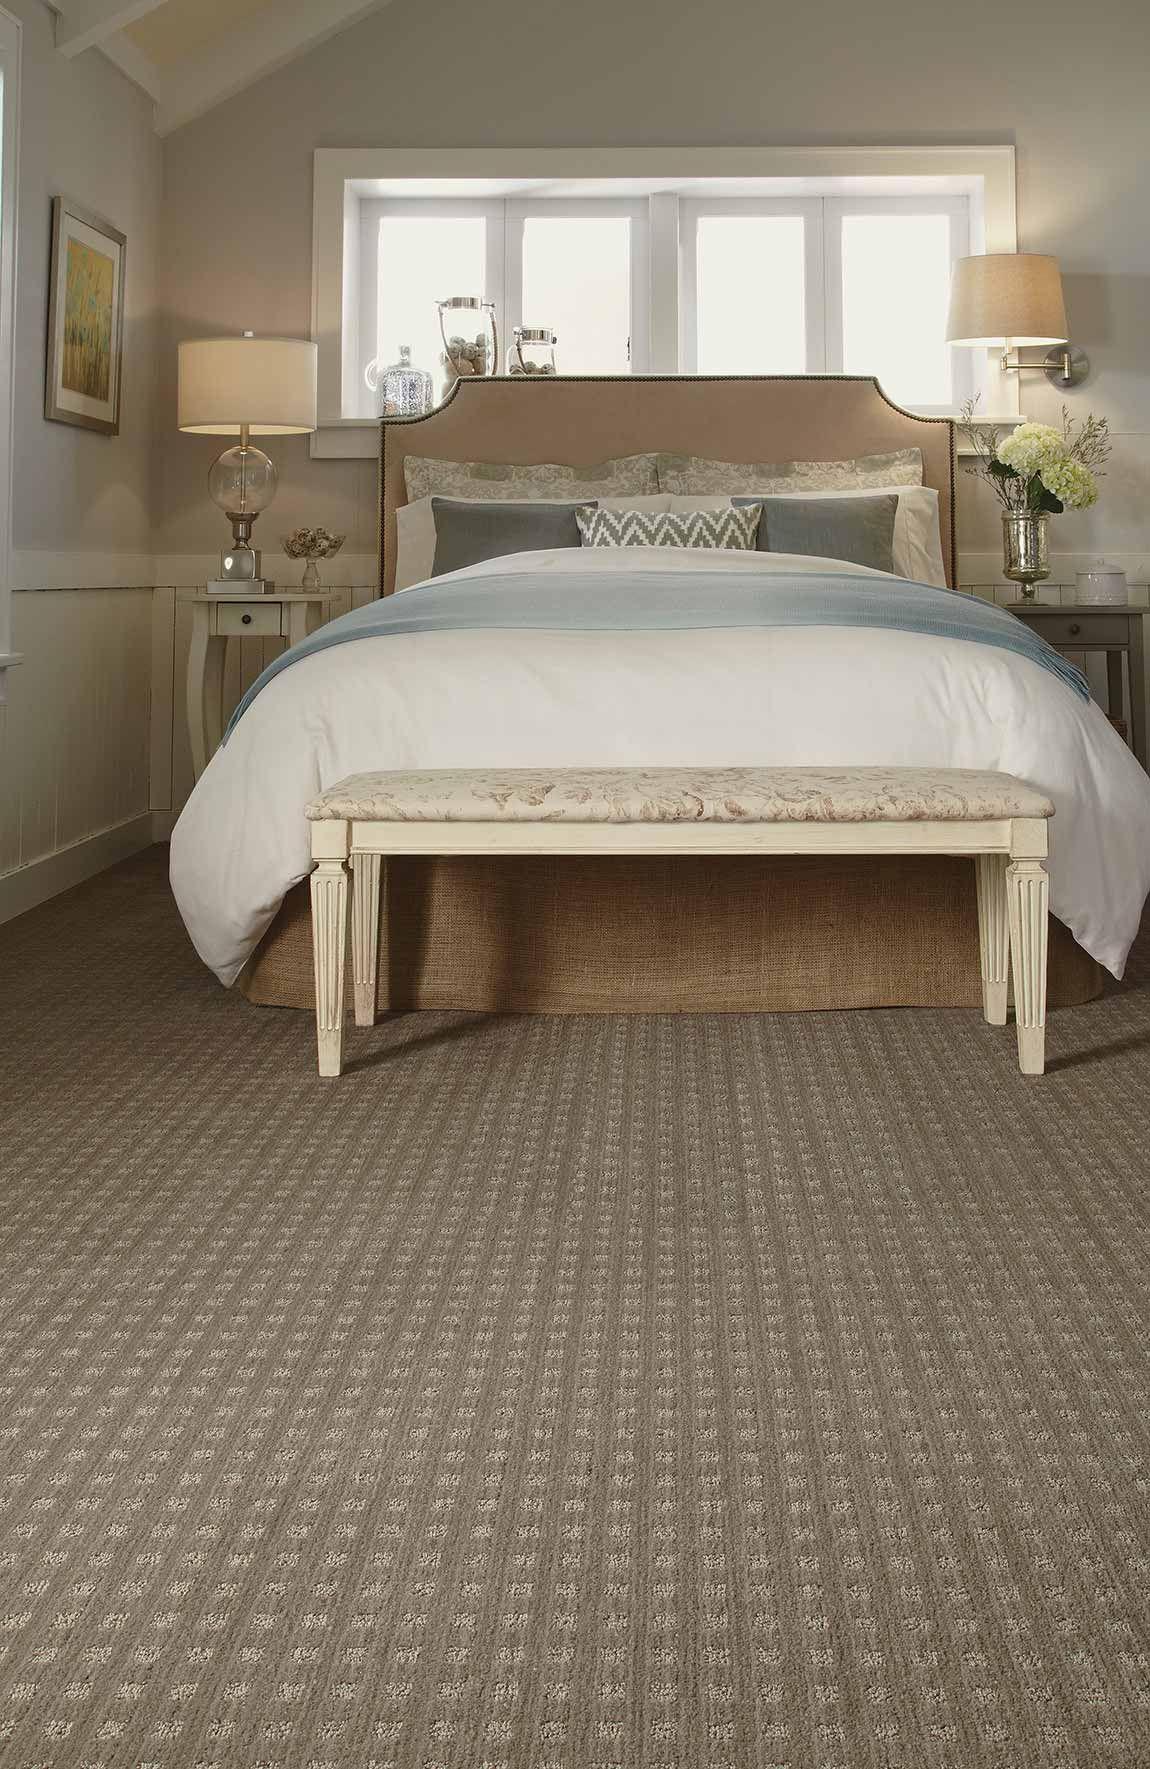 20 Modern Bedroom Carpet Ideas Carpeted Coastal Beach House Bedroom Flooring Designs Flooring America Within Ucw Bedroom Carpet Bedroom Flooring Carpet Design